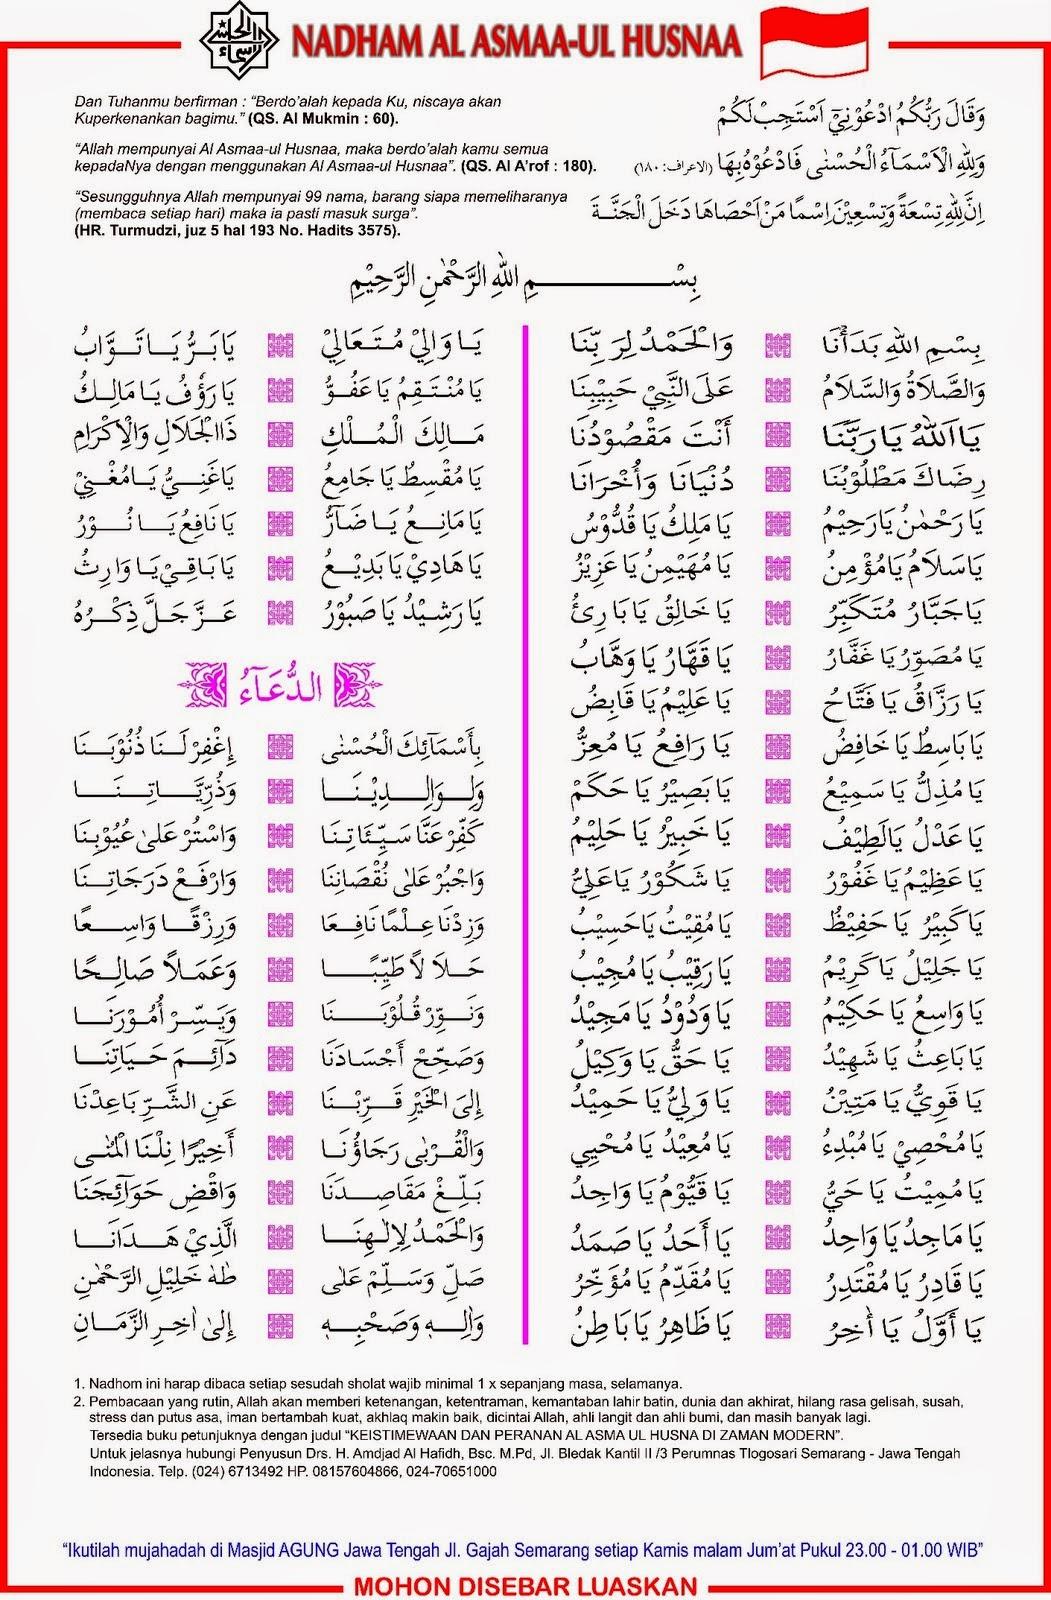 ... correlate a Download tulisan arab asmaul husna dan artinya pdf